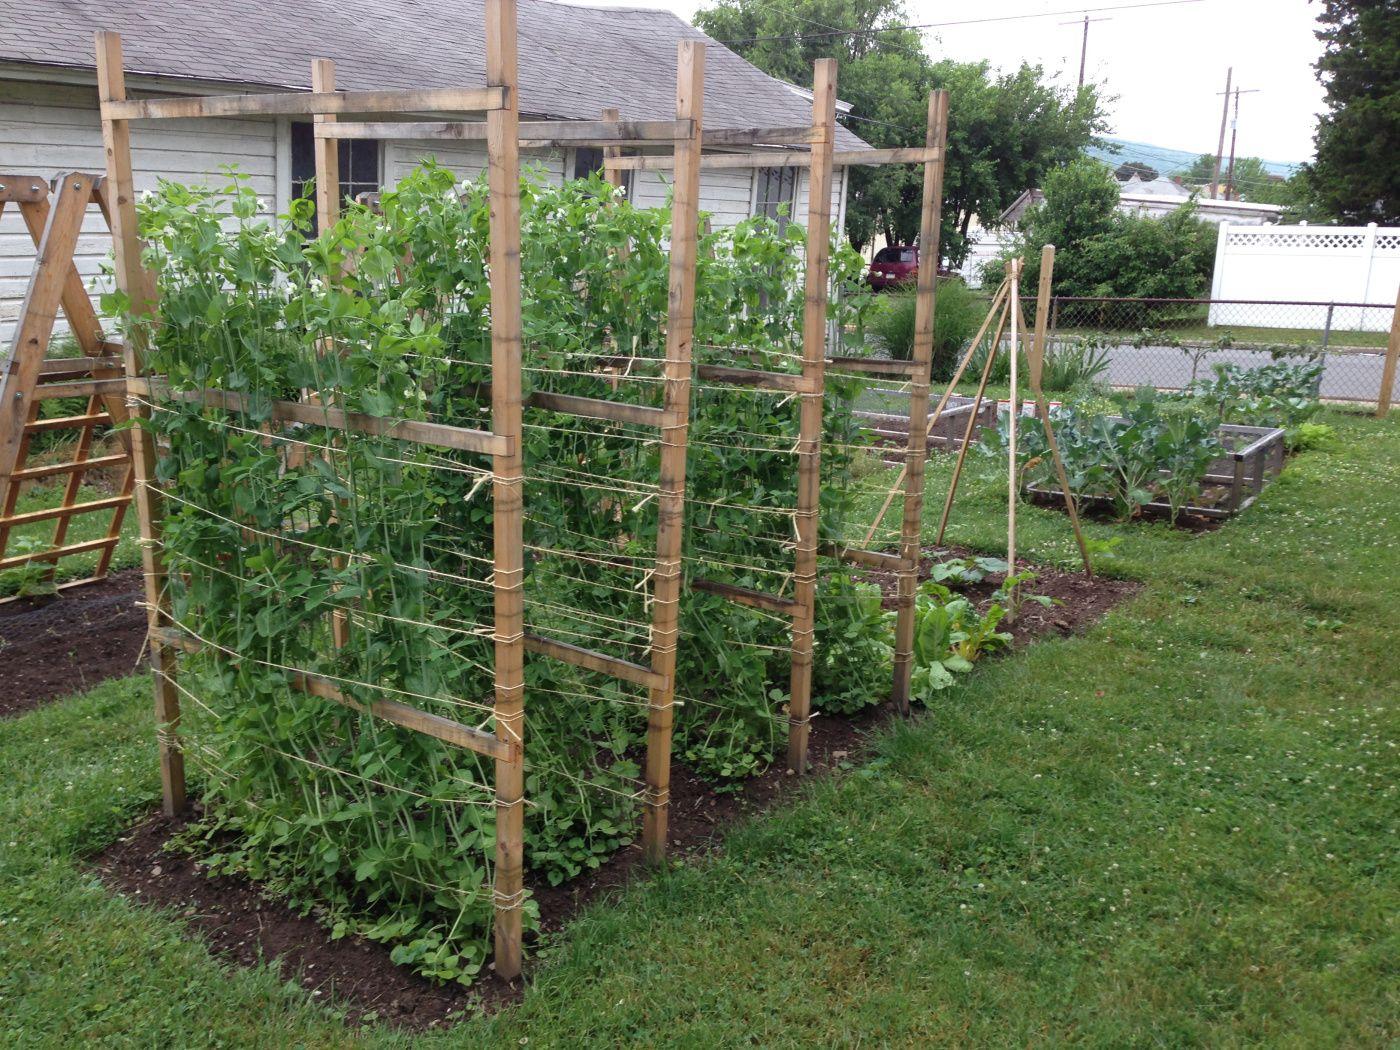 Garden Update 6 16 13 Garden Trellis Snap Peas Garden 400 x 300